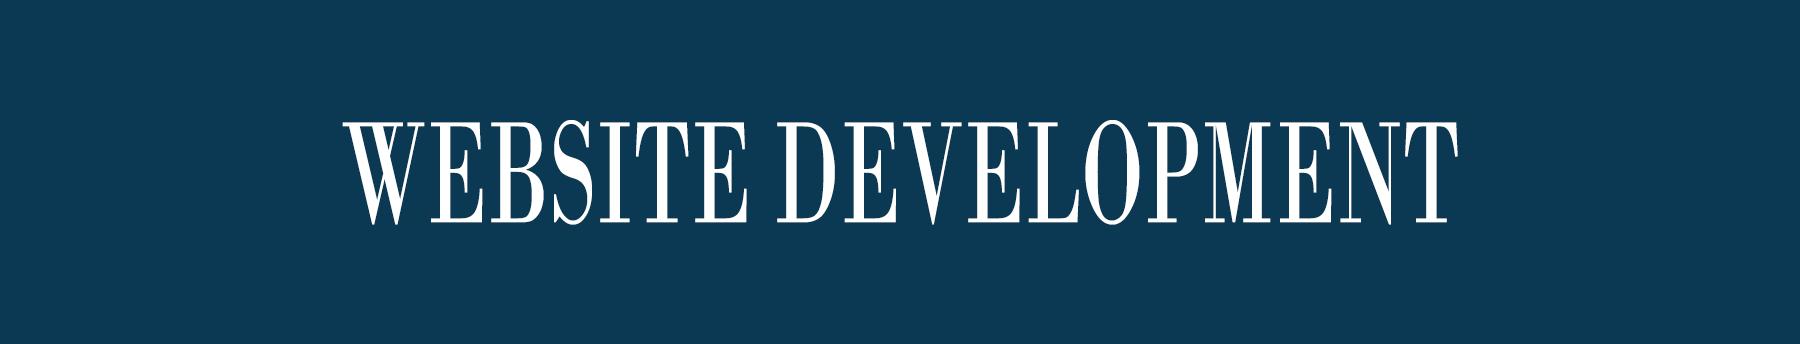 Website Development Title